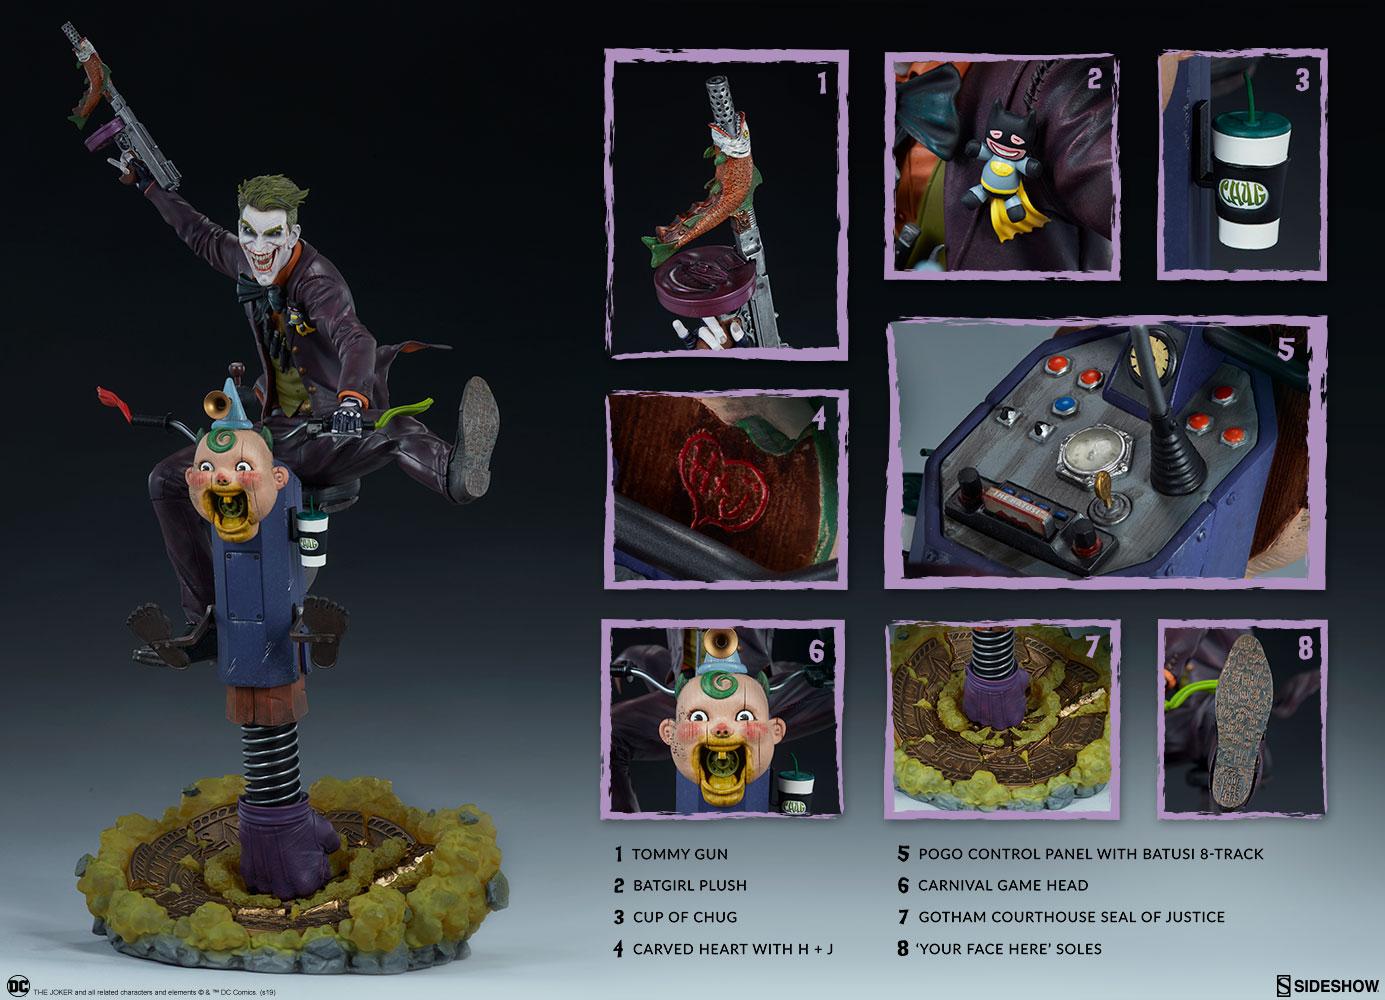 Dc Comics The Joker Premium Formattm Figure By Sideshow Co